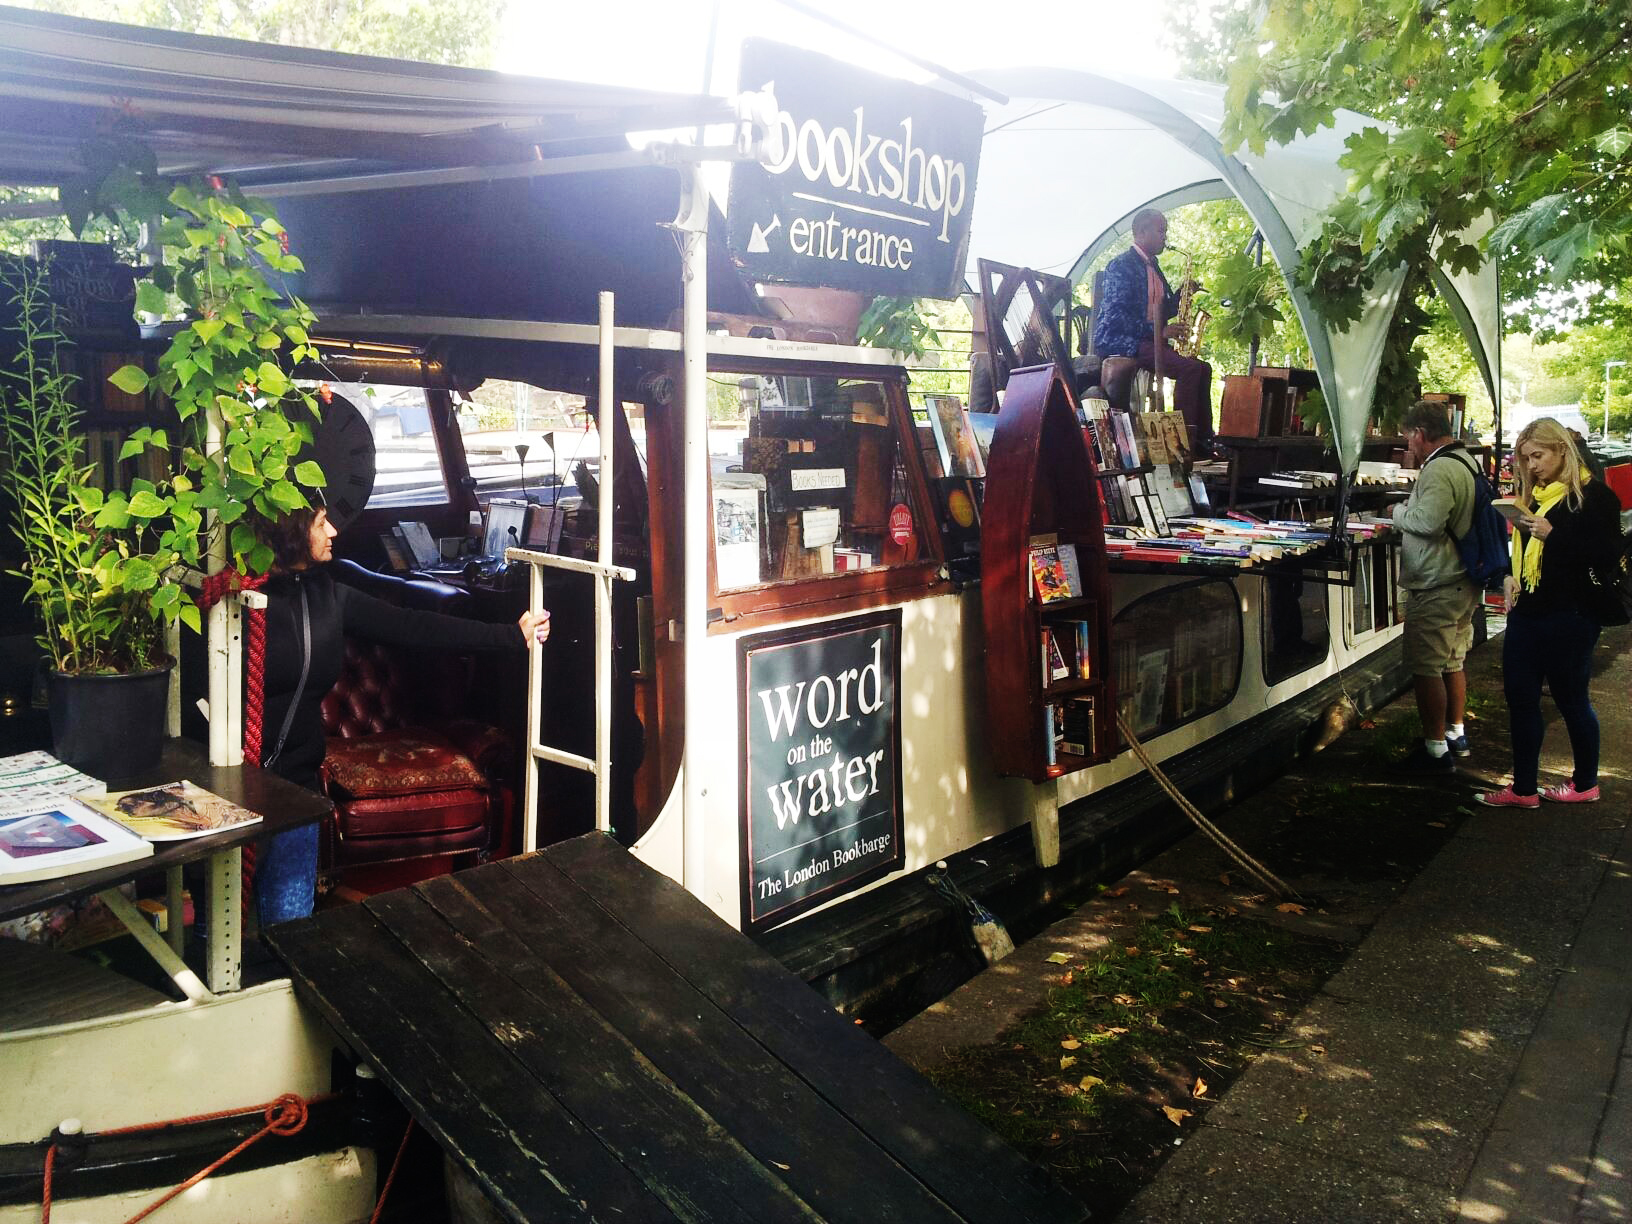 Climb aboard a book barge